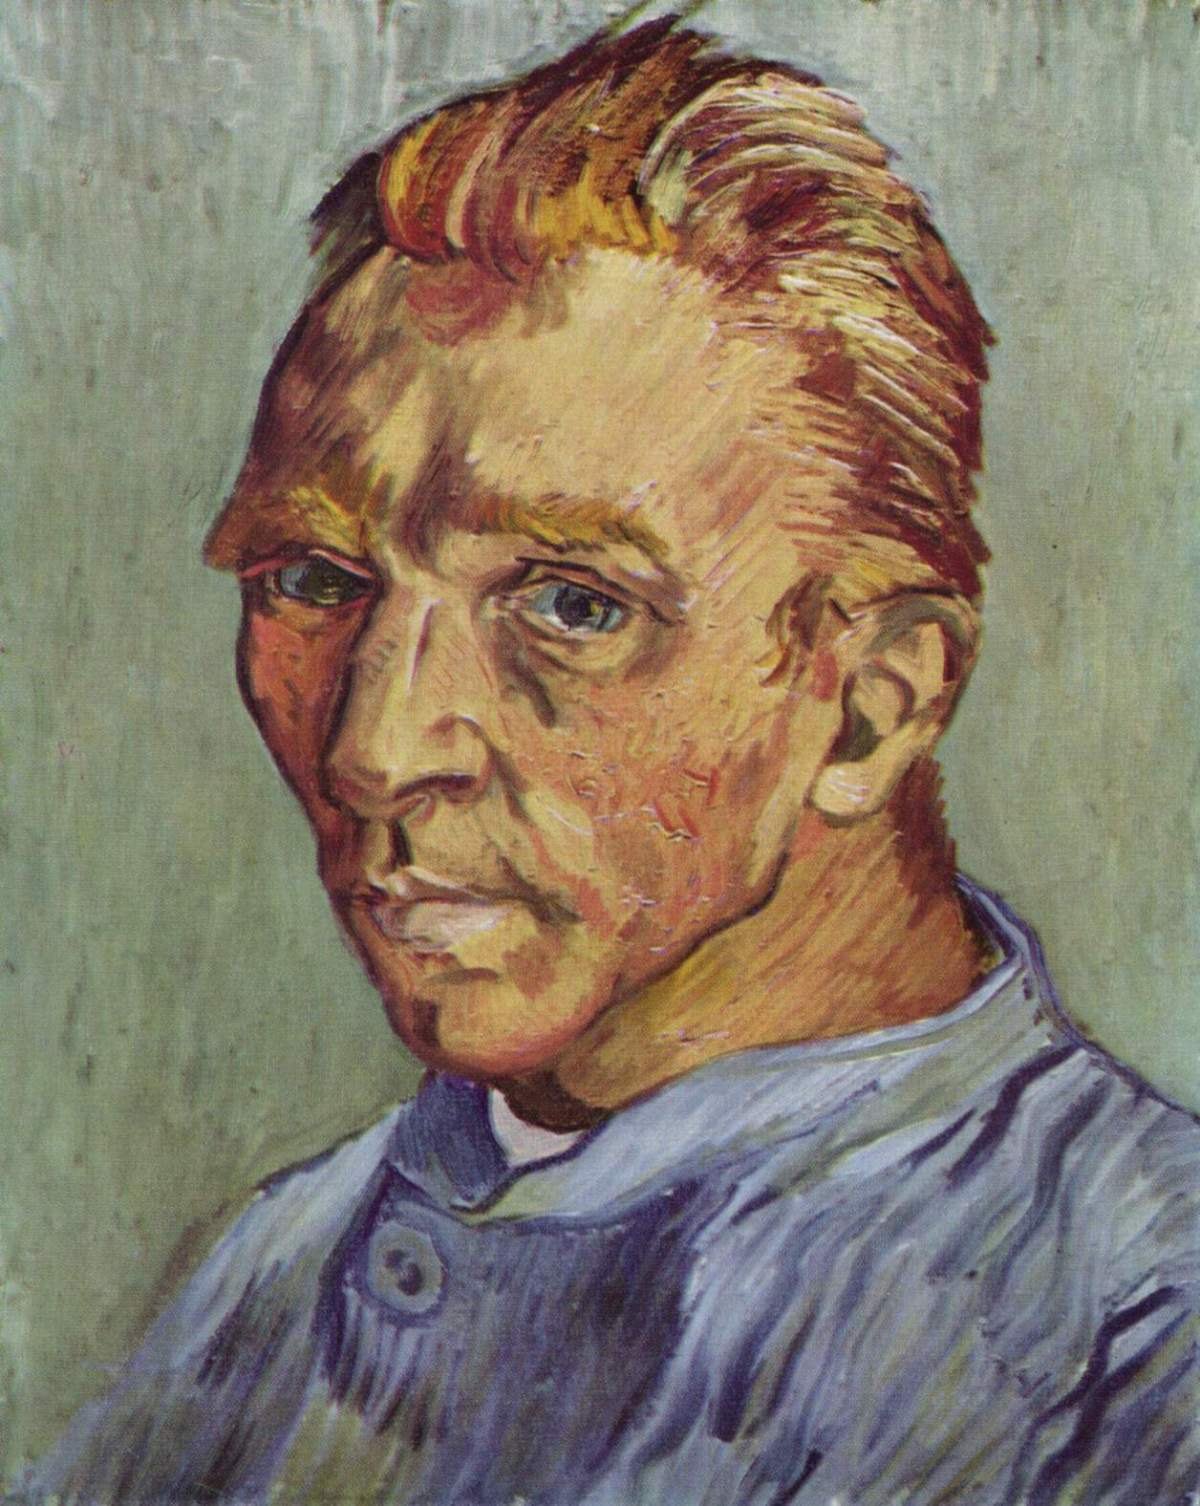 Self Portrait without Beard by Vincent van Gogh